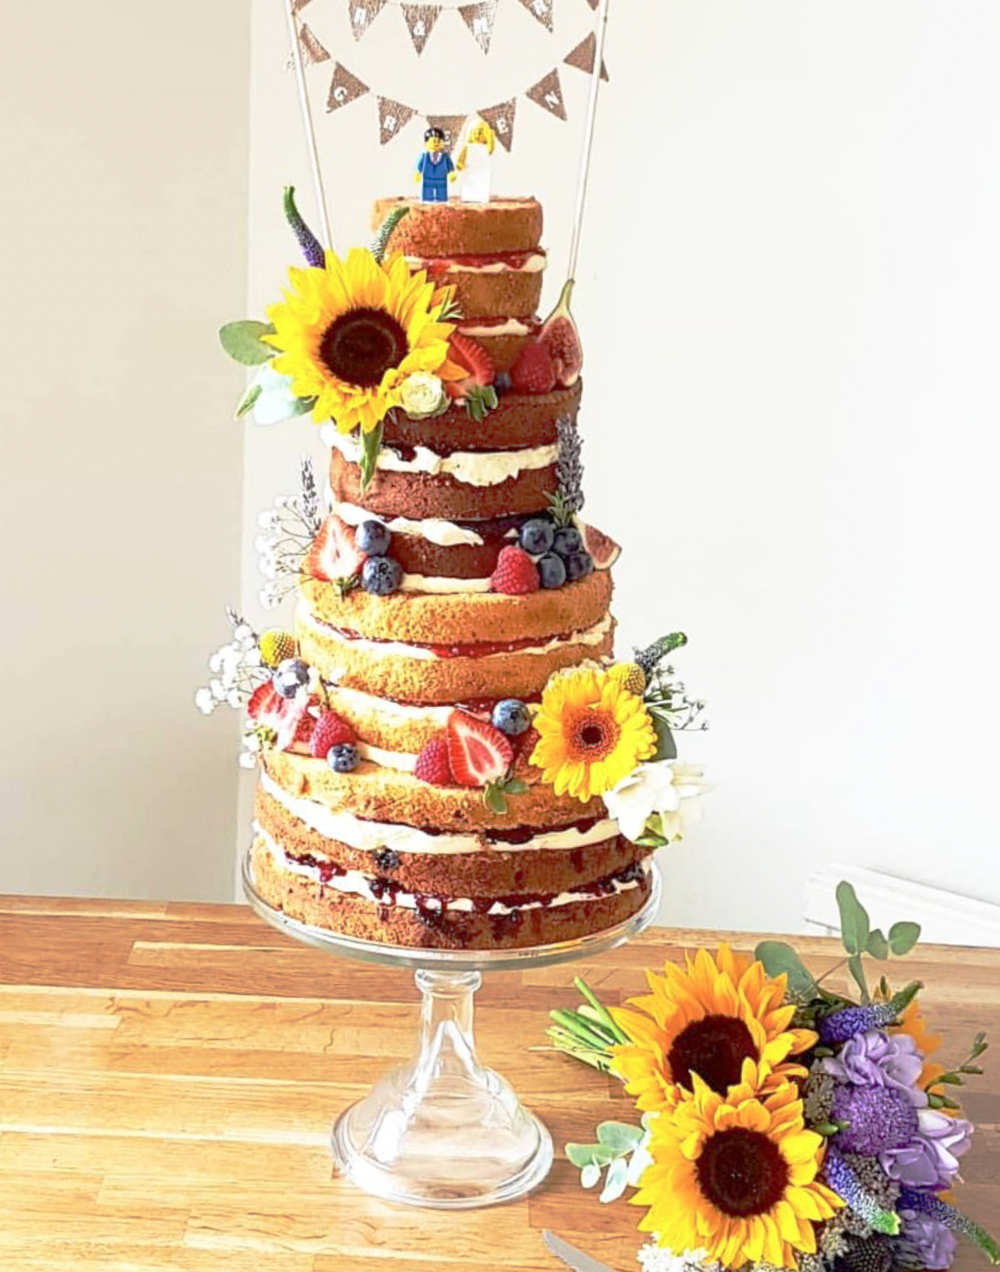 DOTTY ROSE CAKE DESIGN 4 TIER NAKED WEDDING CAKE